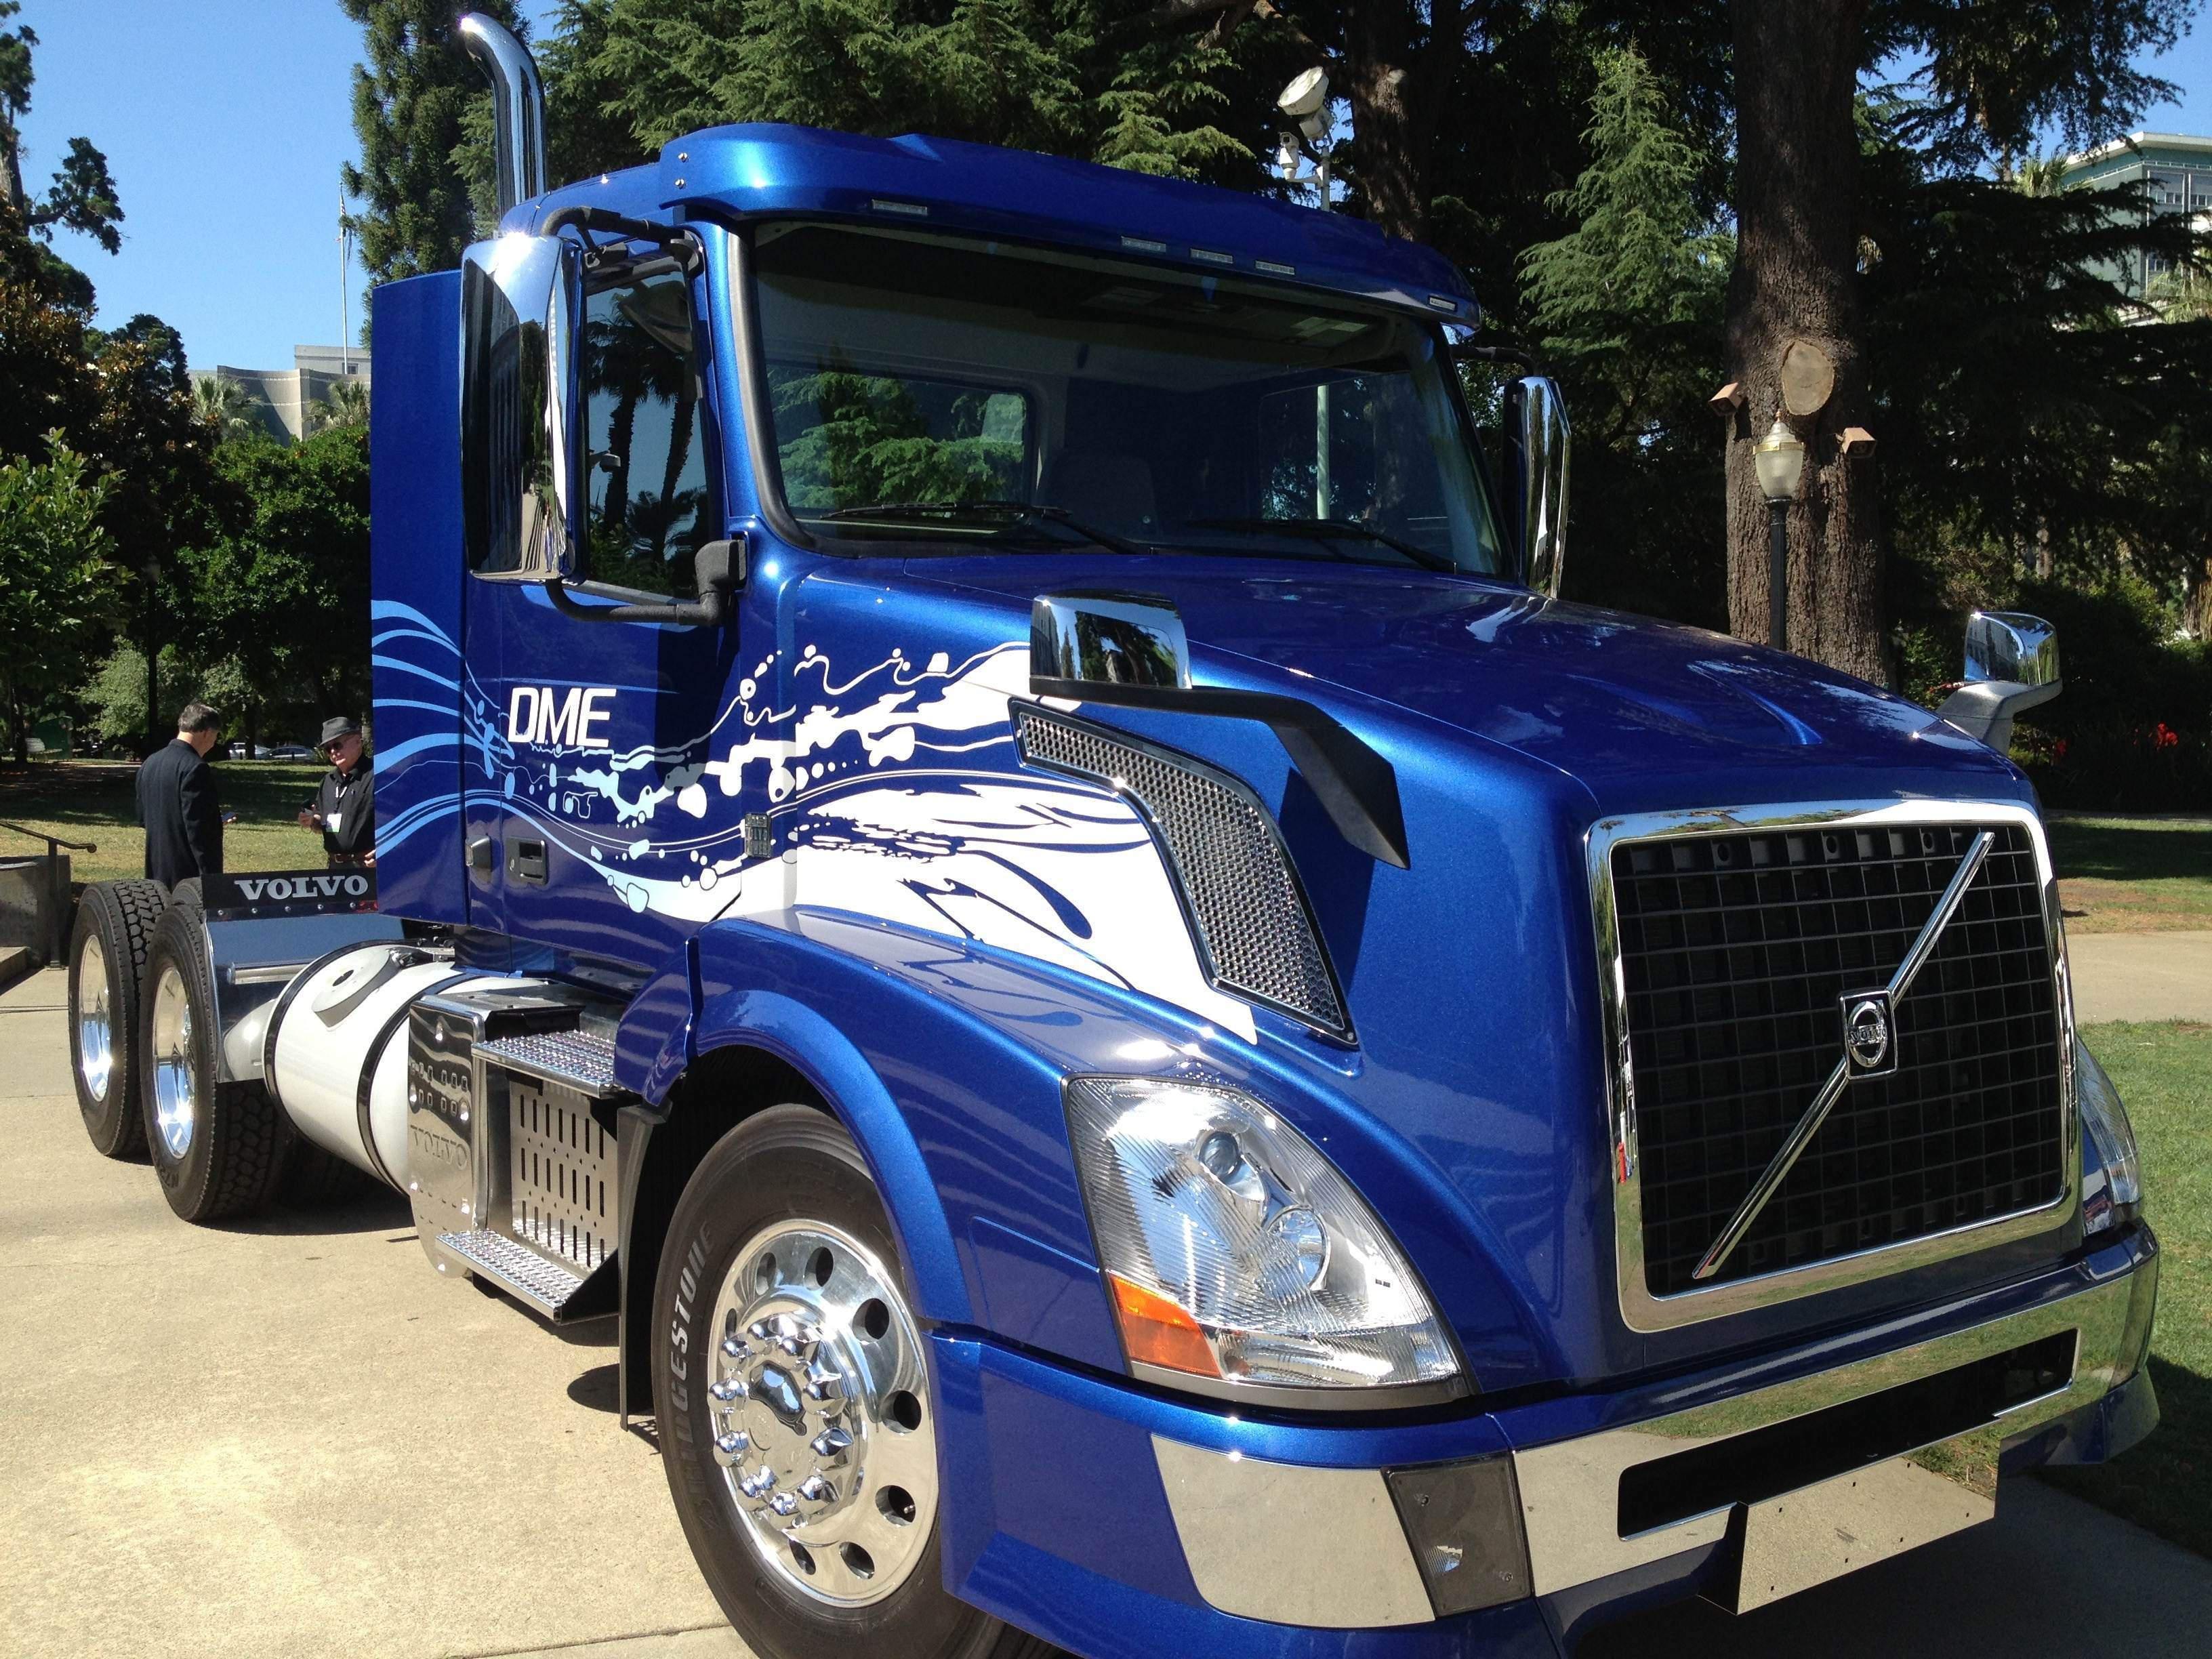 trucks volvo truckbreak top ltd cheap used parts sales export img quality